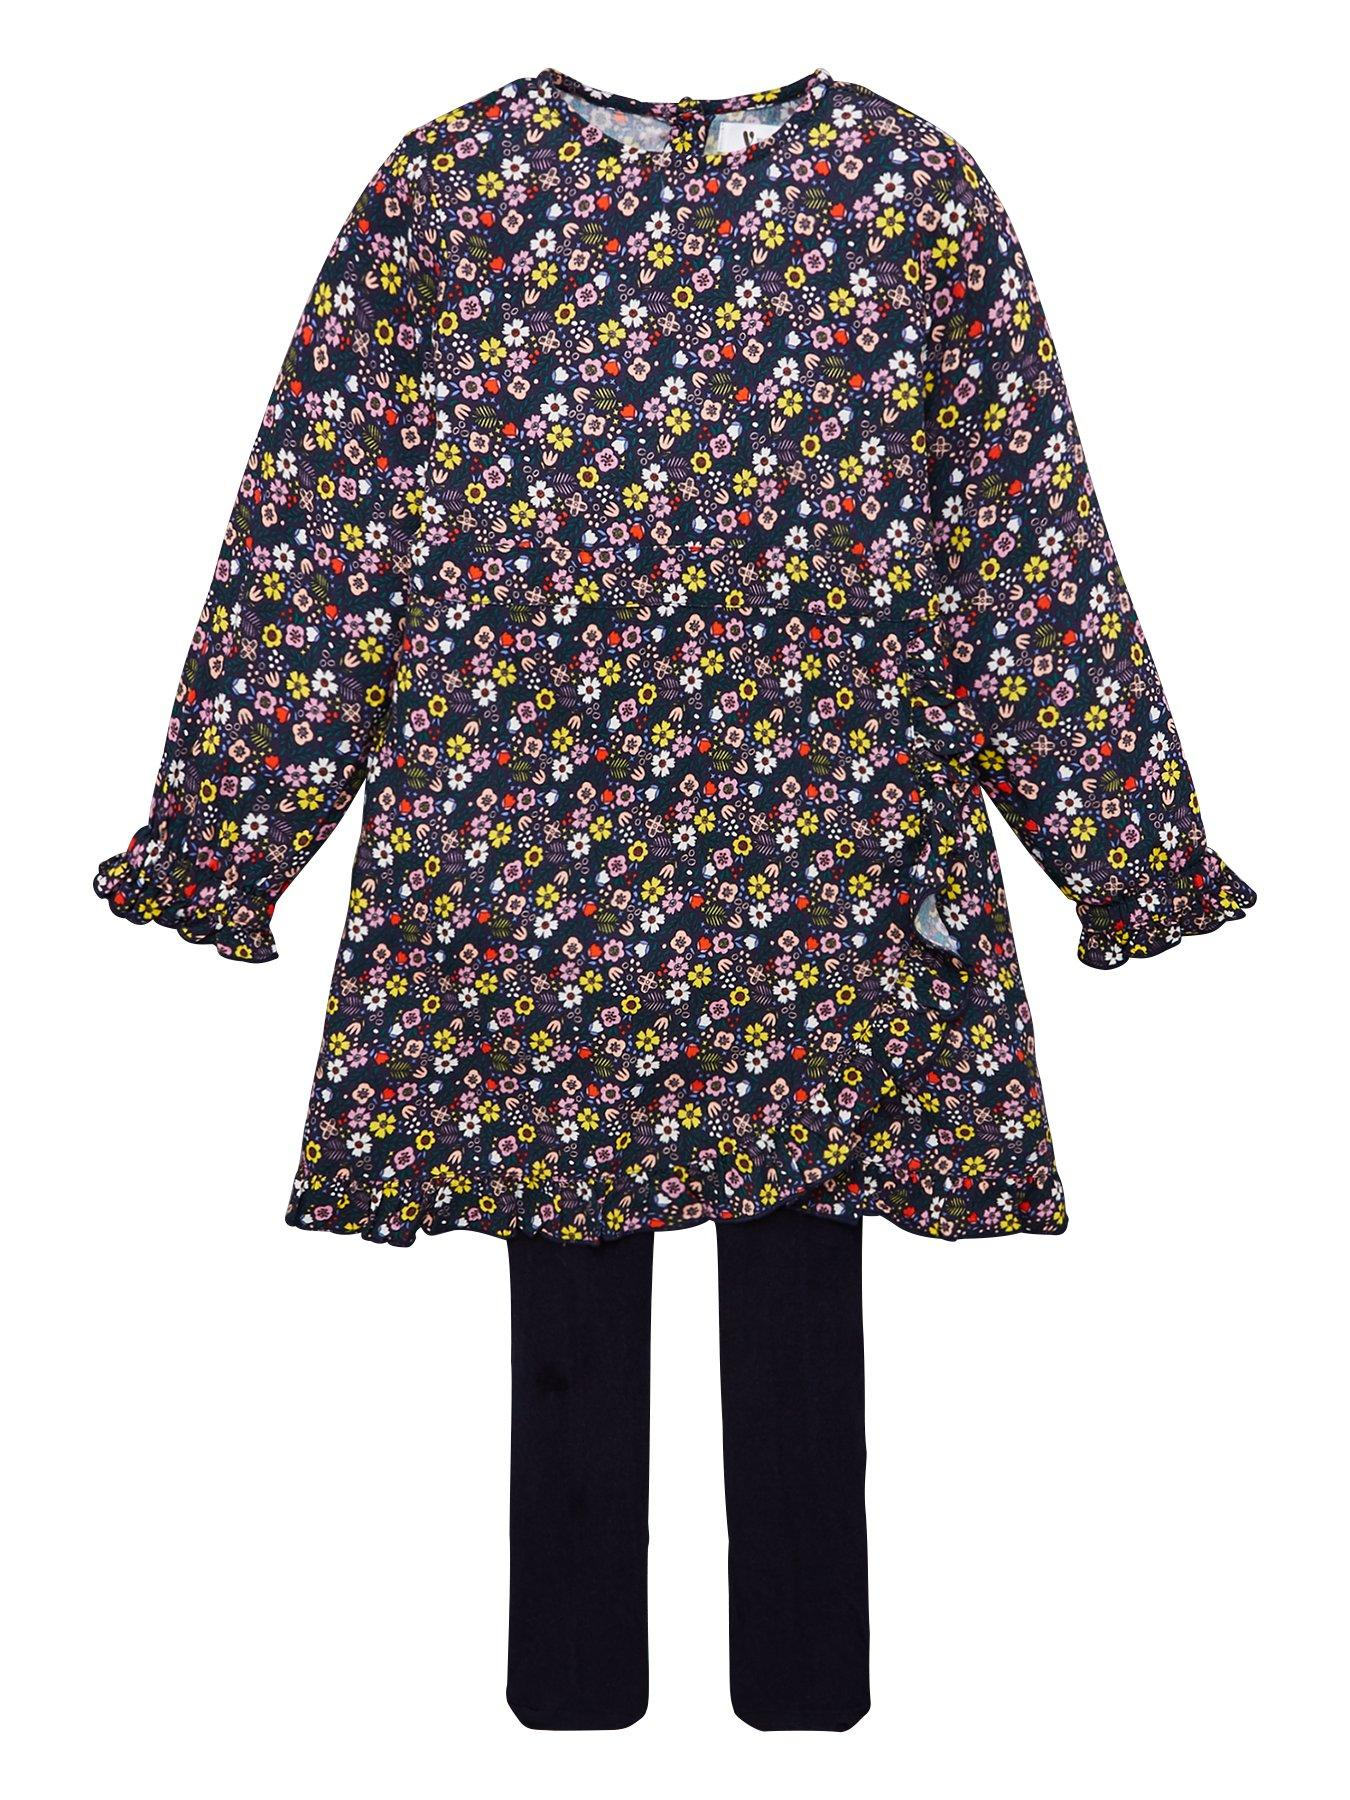 Warner Bros Girls Stars 2-Piece Skirt Set